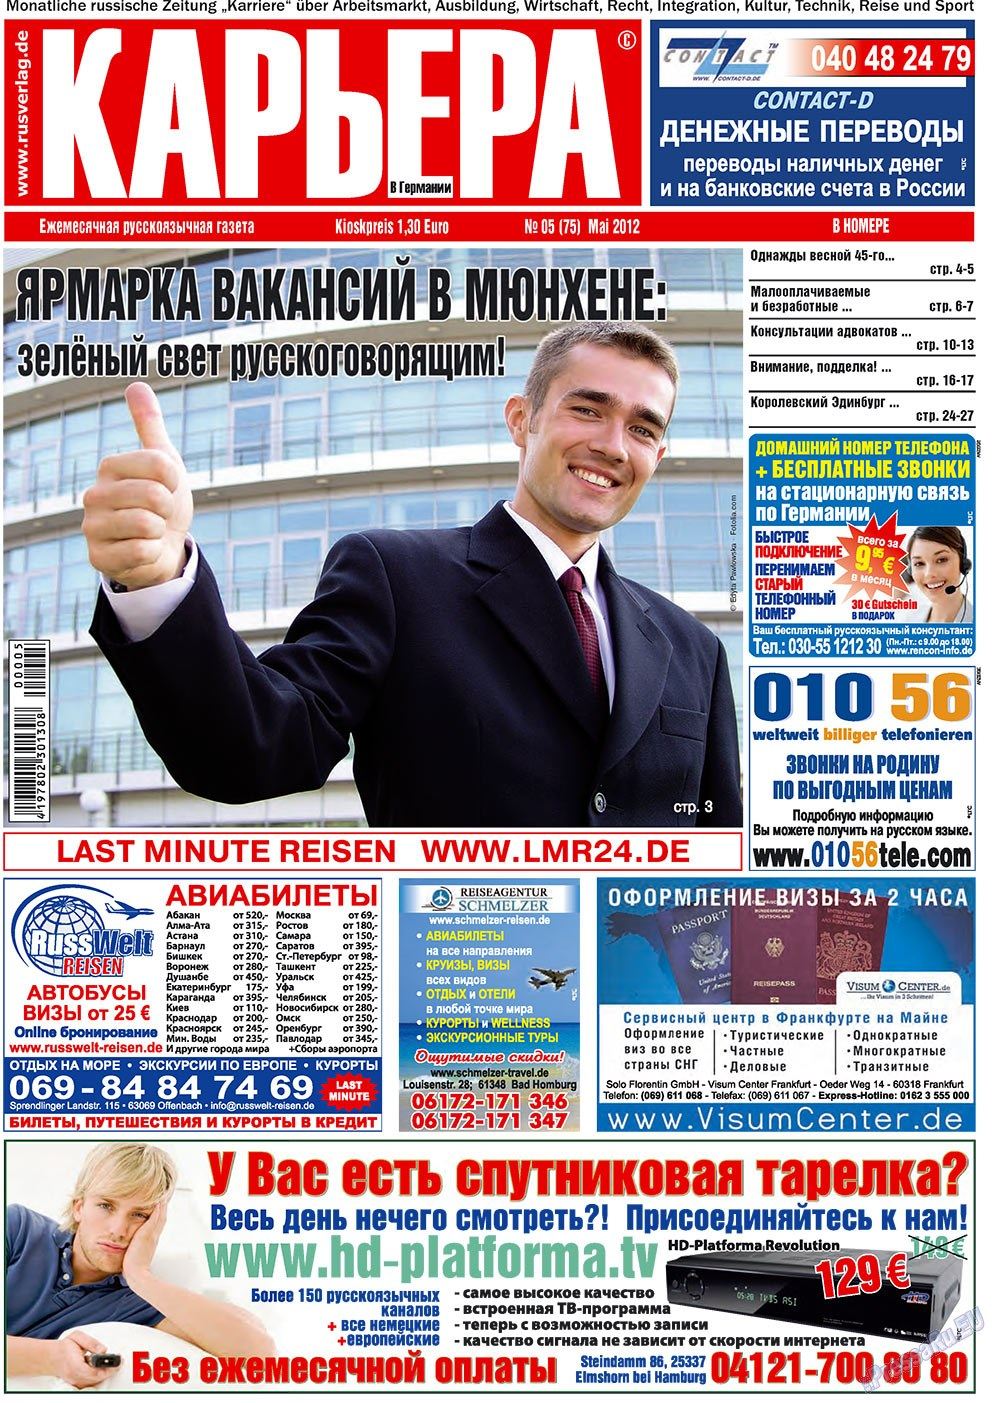 Карьера (газета). 2012 год, номер 5, стр. 1